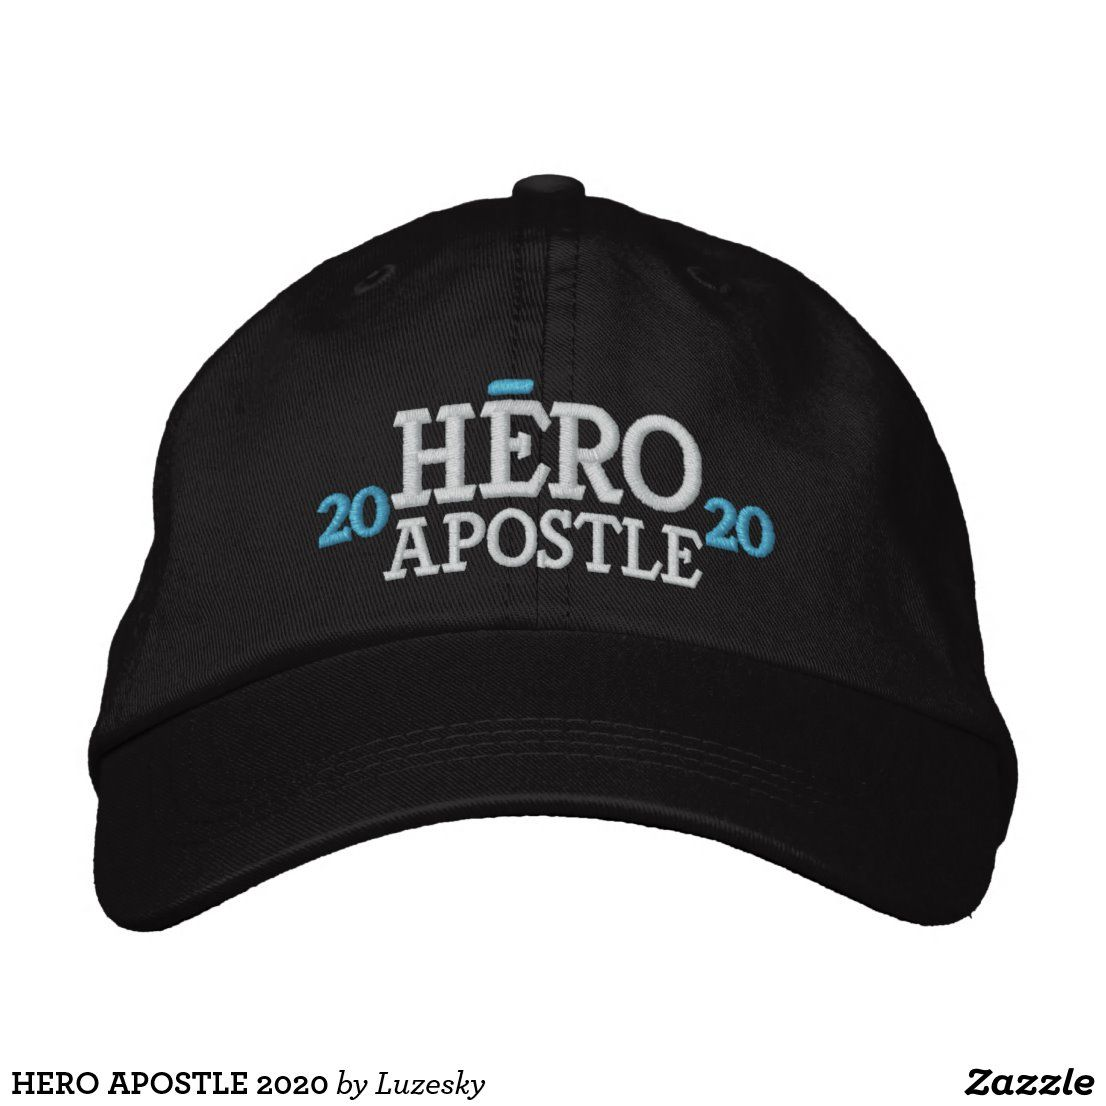 Hero apostle 2020 embroidered baseball hat